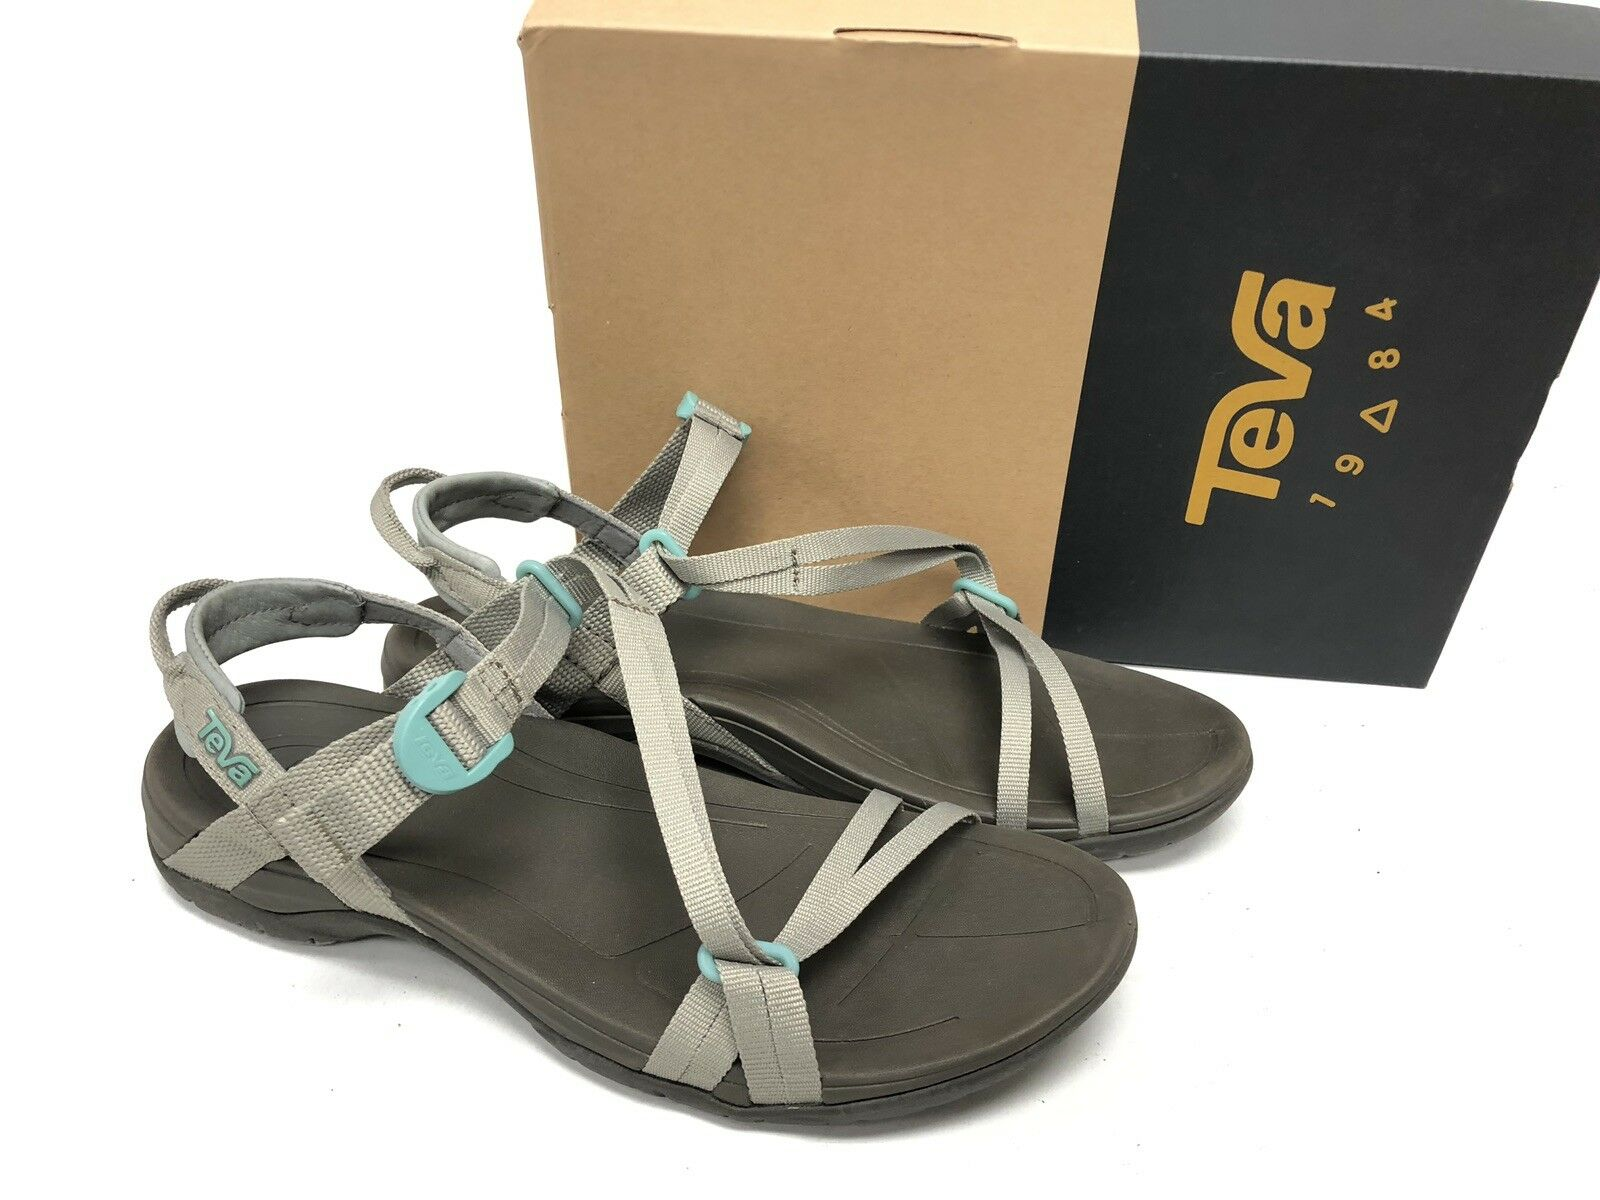 Teva Sirra desierto Sage Sandalia Zapato De Senderismo Correas de cruce de mujer 1019240